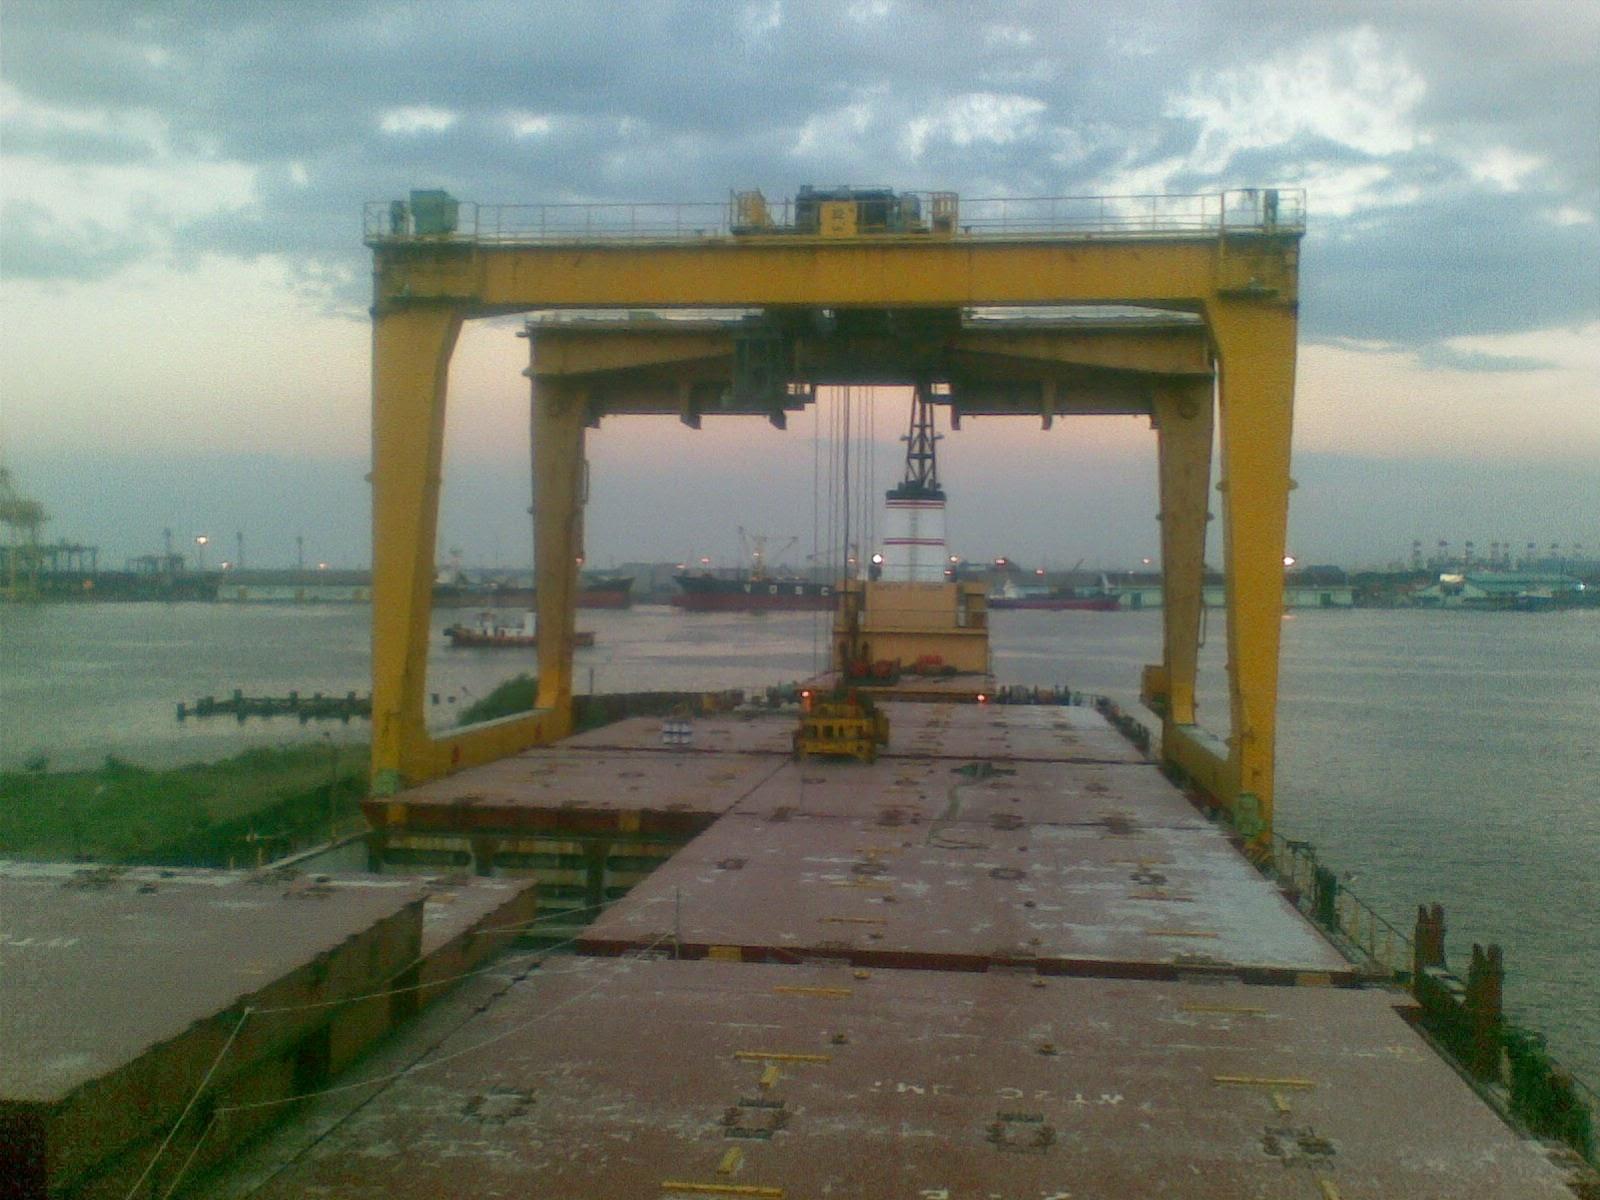 Istilah Pada Penanganan Muatan Dan Transportasi Laut Stature Meter Alat Pengukur Tinggi Badan